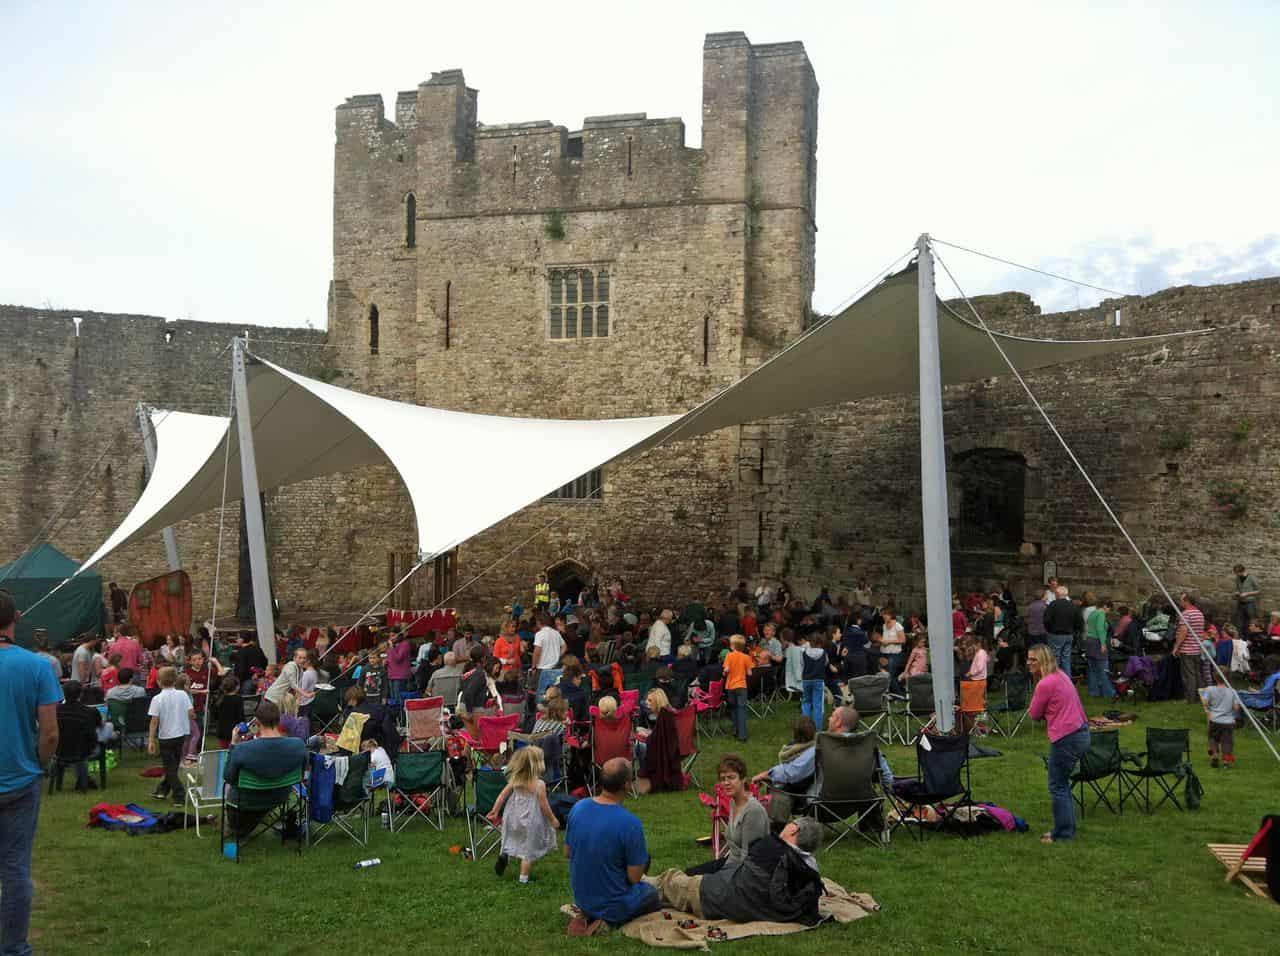 Chepstow Castle & Opera Holland Park - Architen Landrell